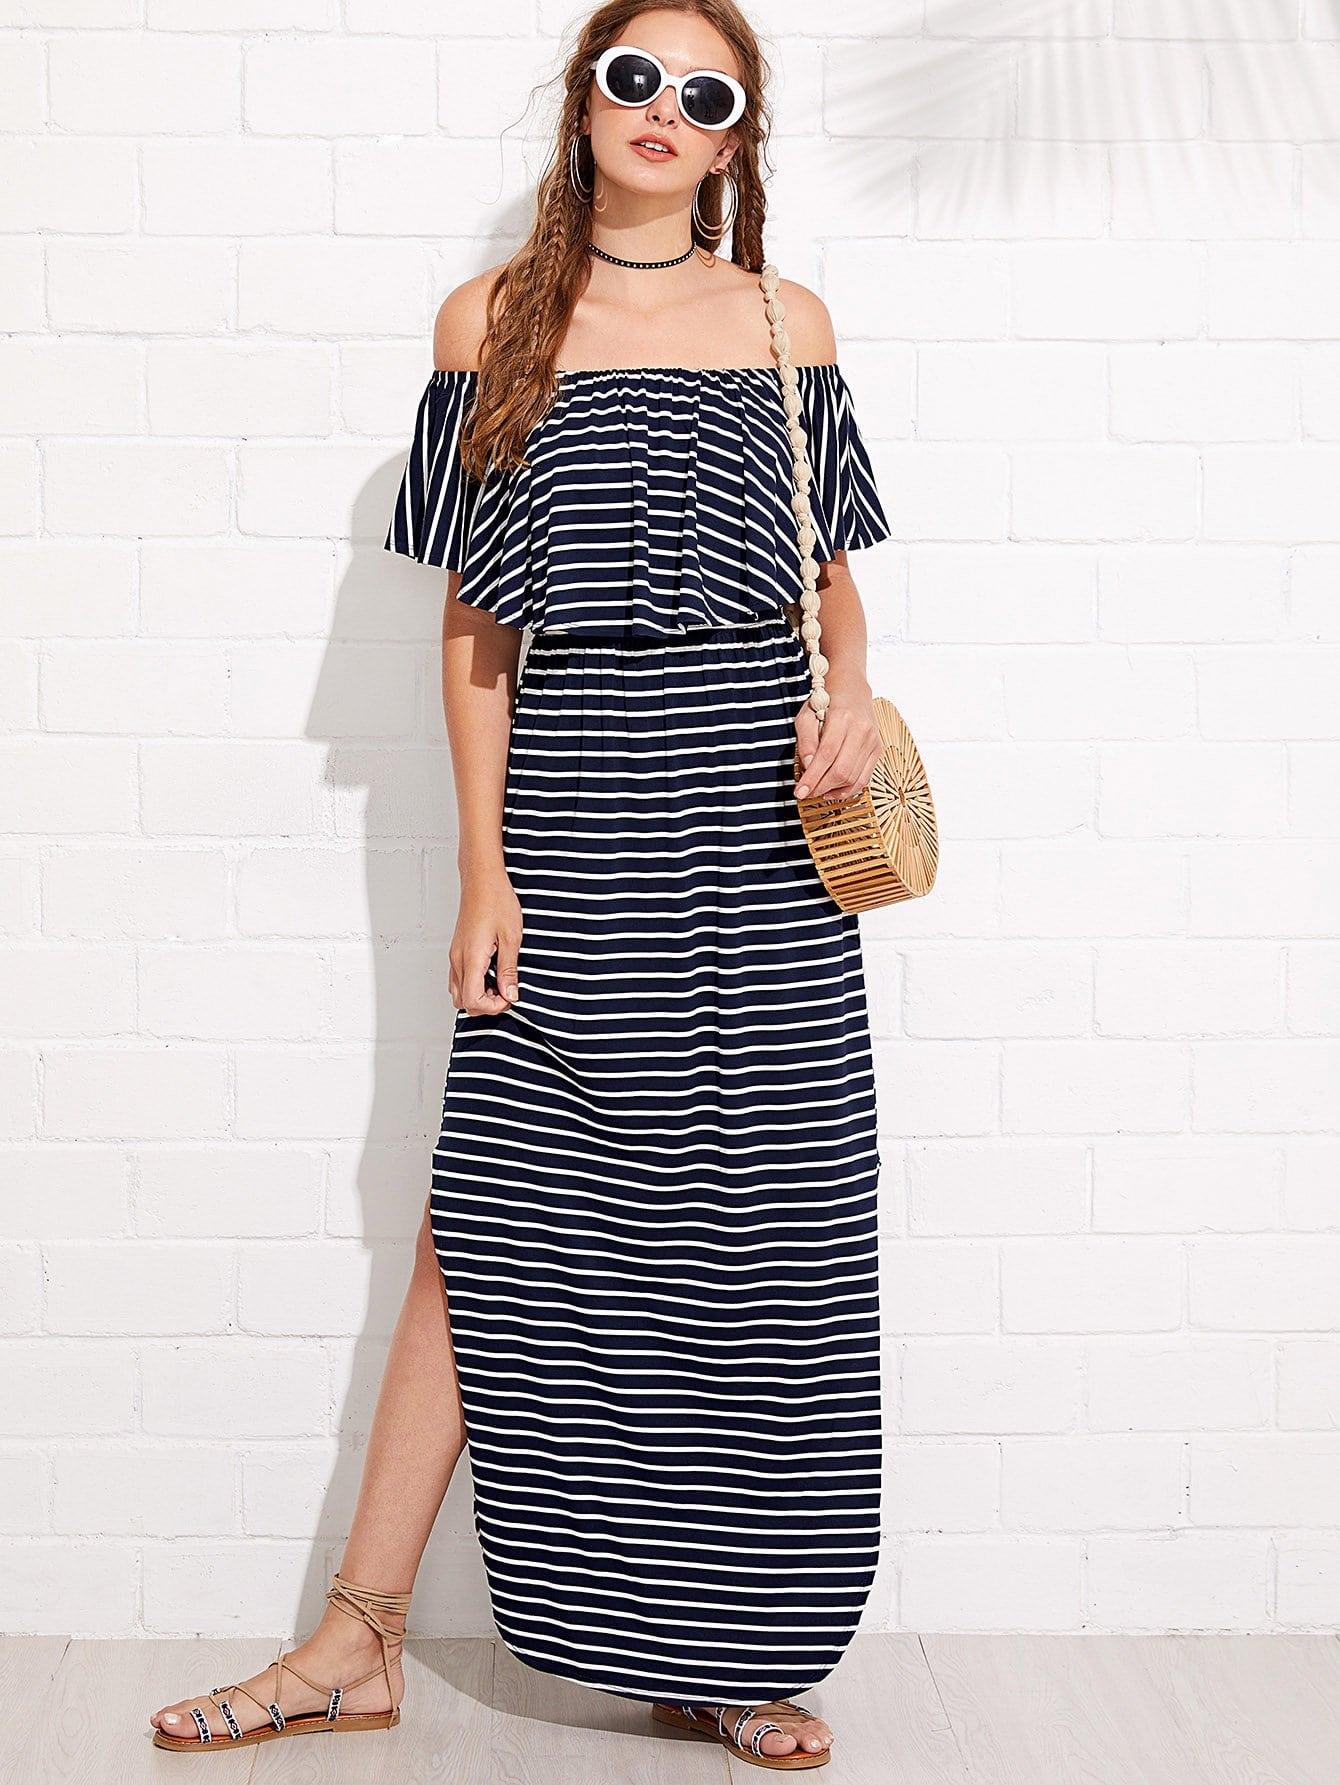 Flounce Layered Neck Striped Curved Hem Dress apricot v neck lace detail curved hem flared sleeve dress